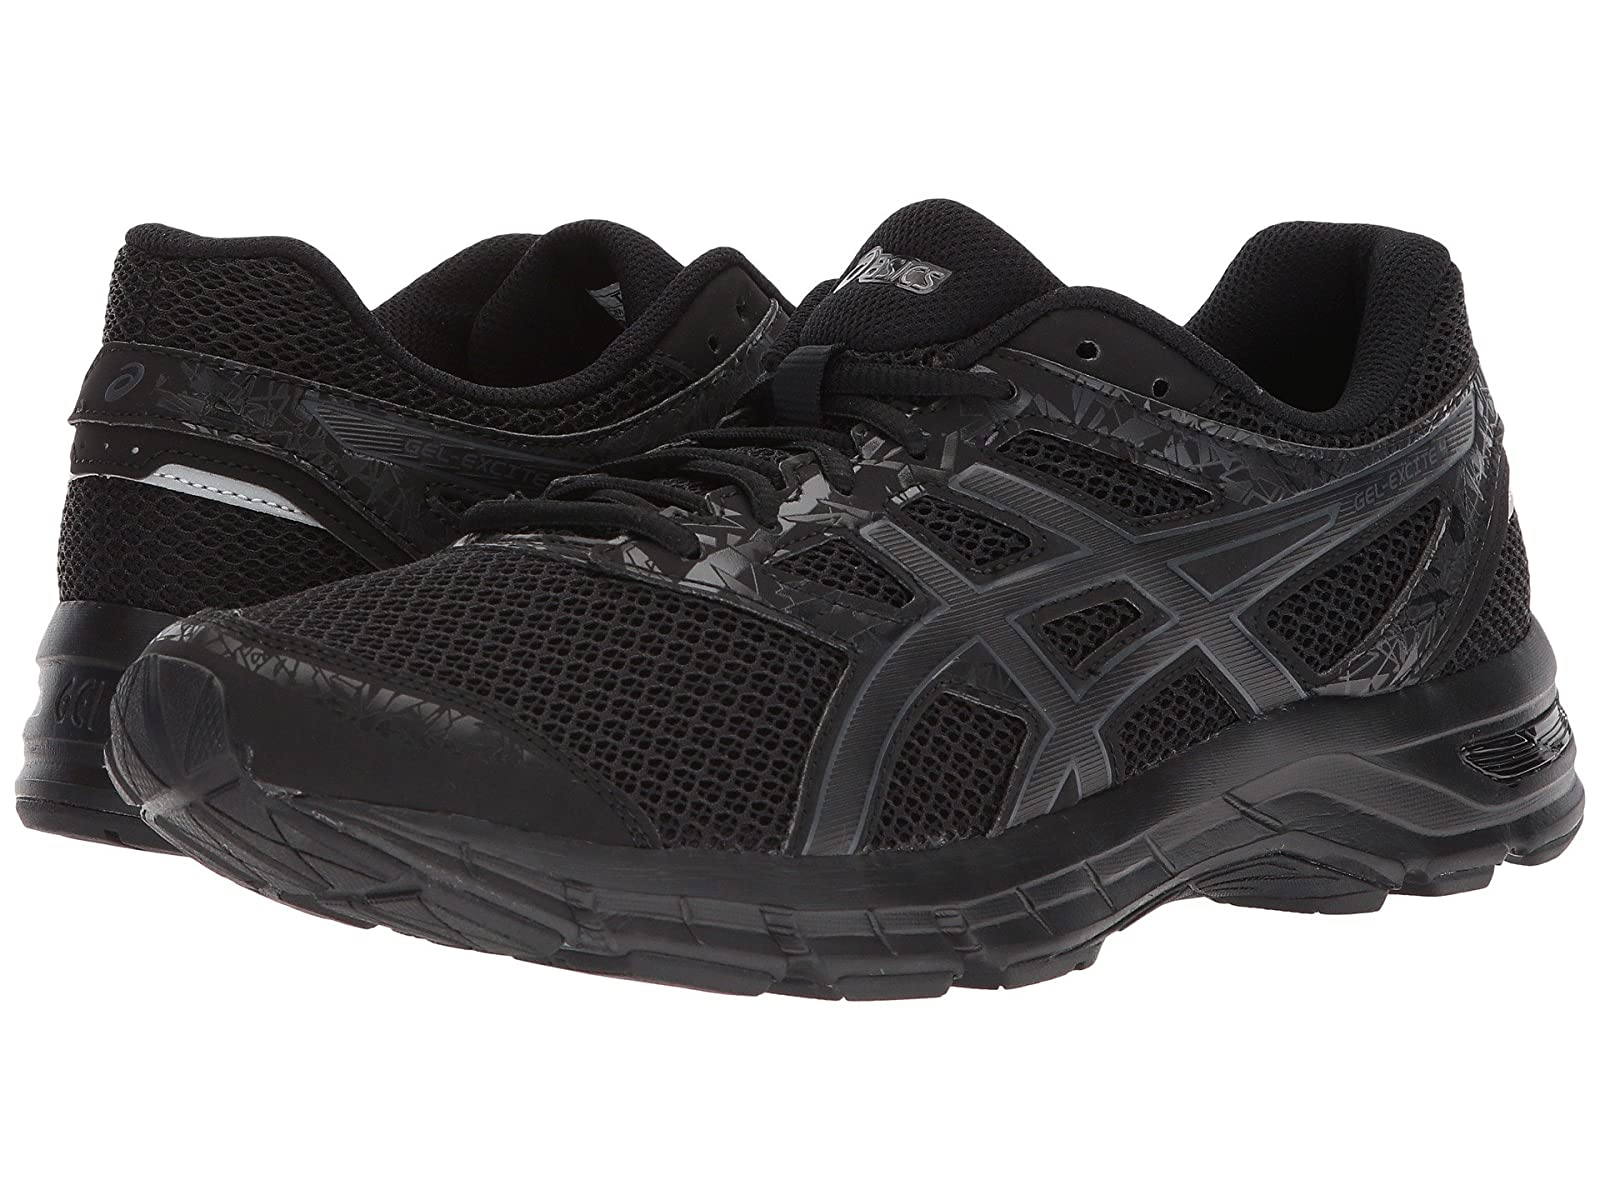 ASICS Gel-Excite® 4Atmospheric grades have affordable shoes